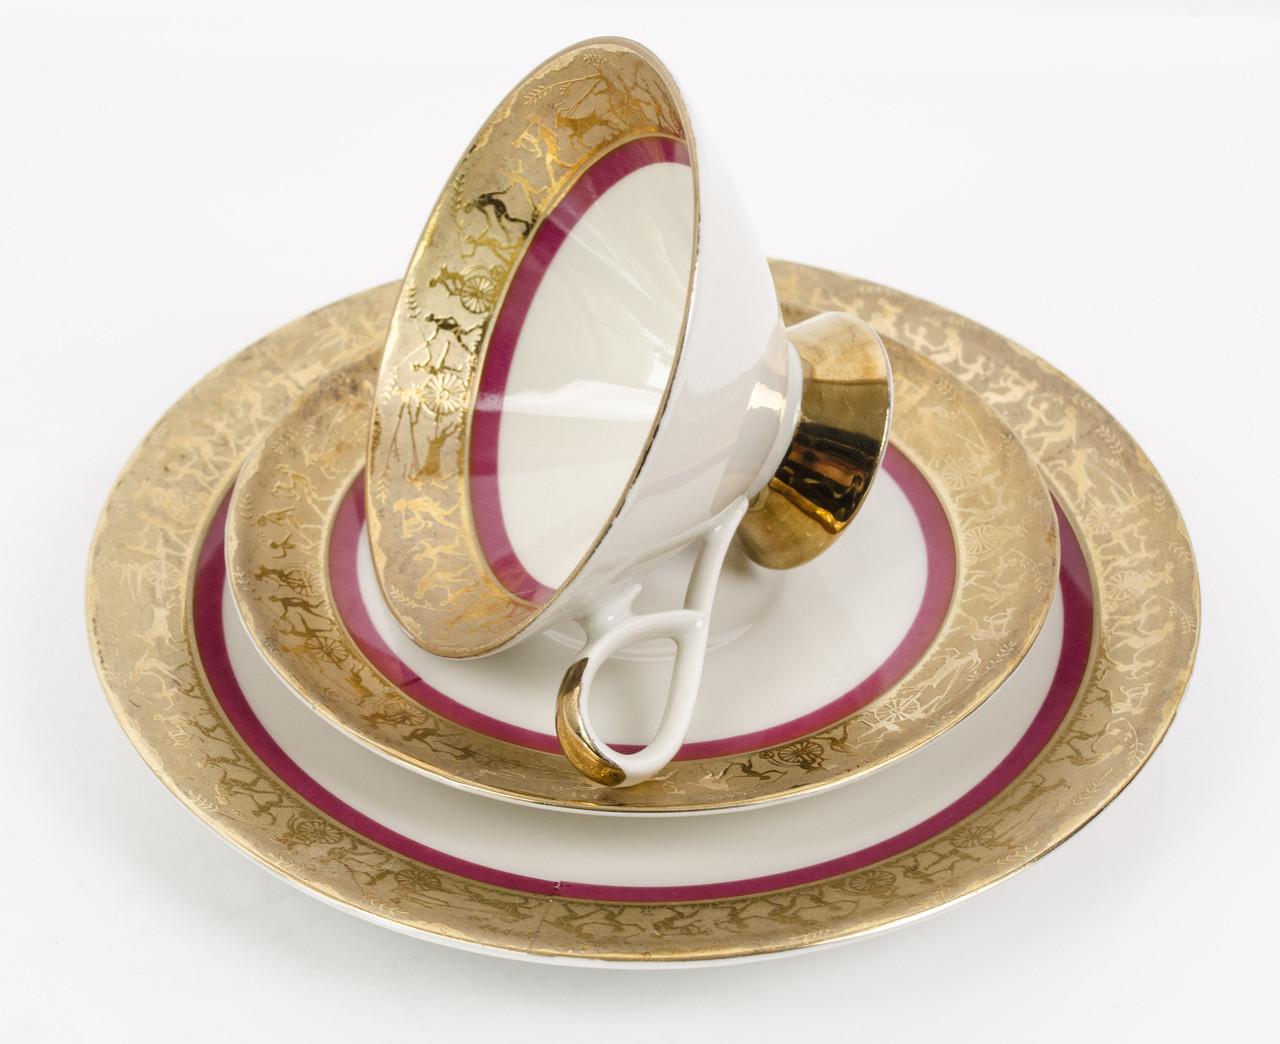 Антикварная чашка, блюдце, тарелка, фарфор, Германия, GAREIS WALDSASSEN